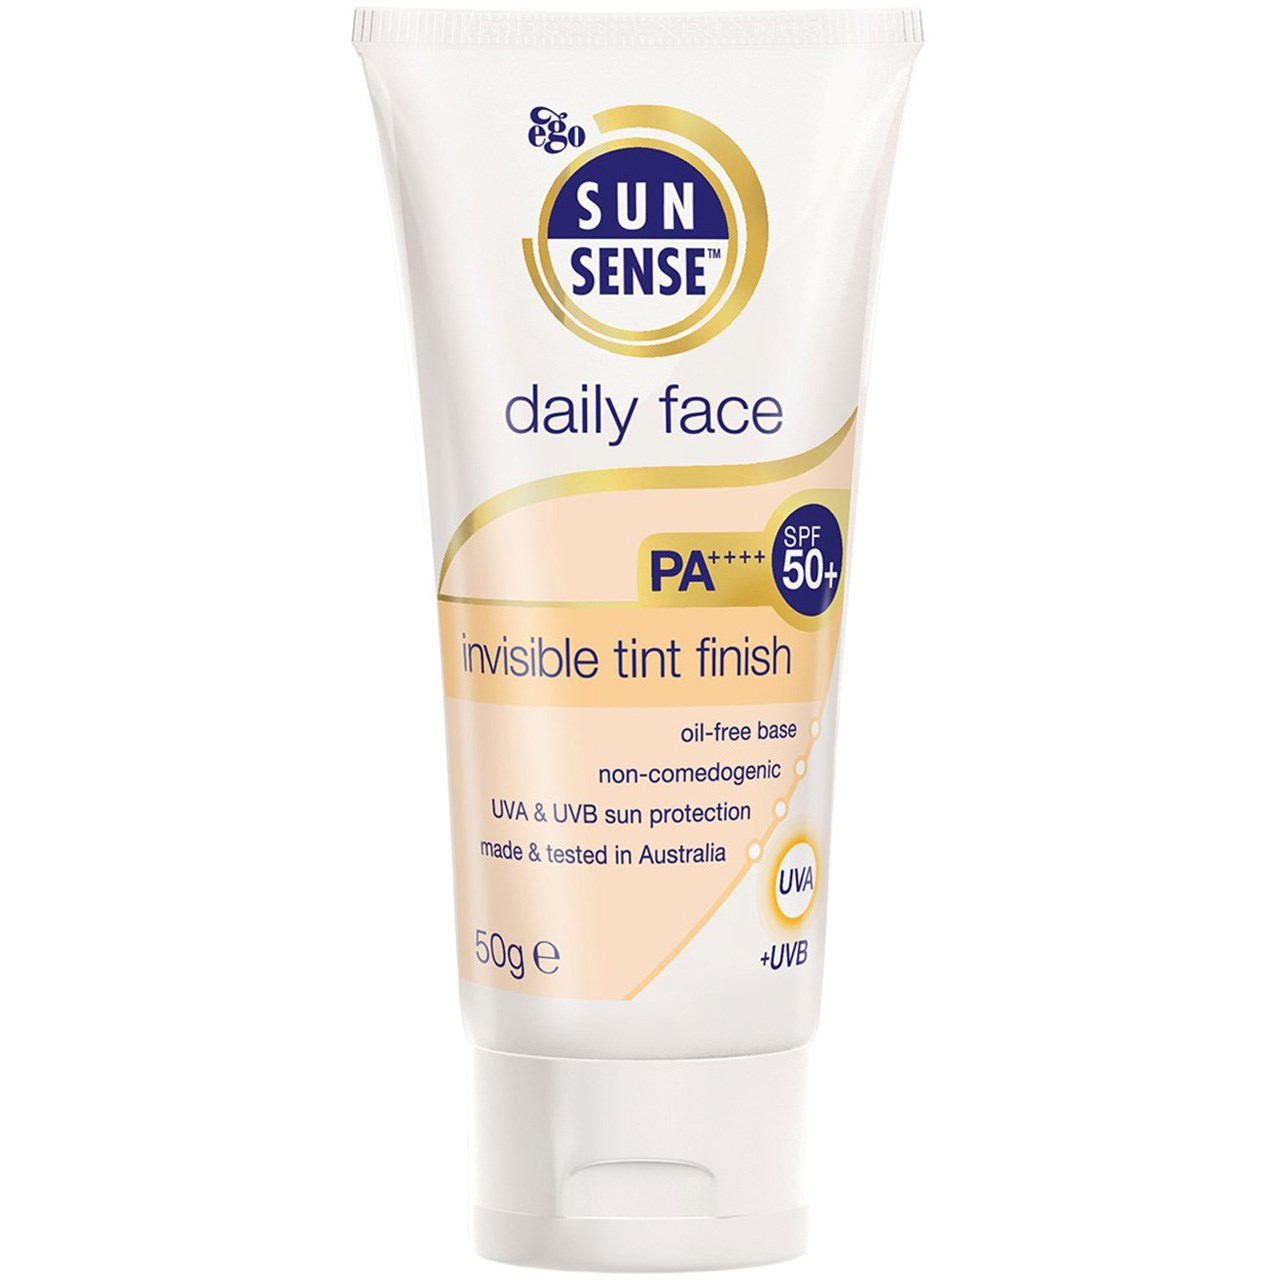 قیمت کرم ضد آفتاب سان سنس مدل Daily Face SPF50plus مقدار 50 گرم